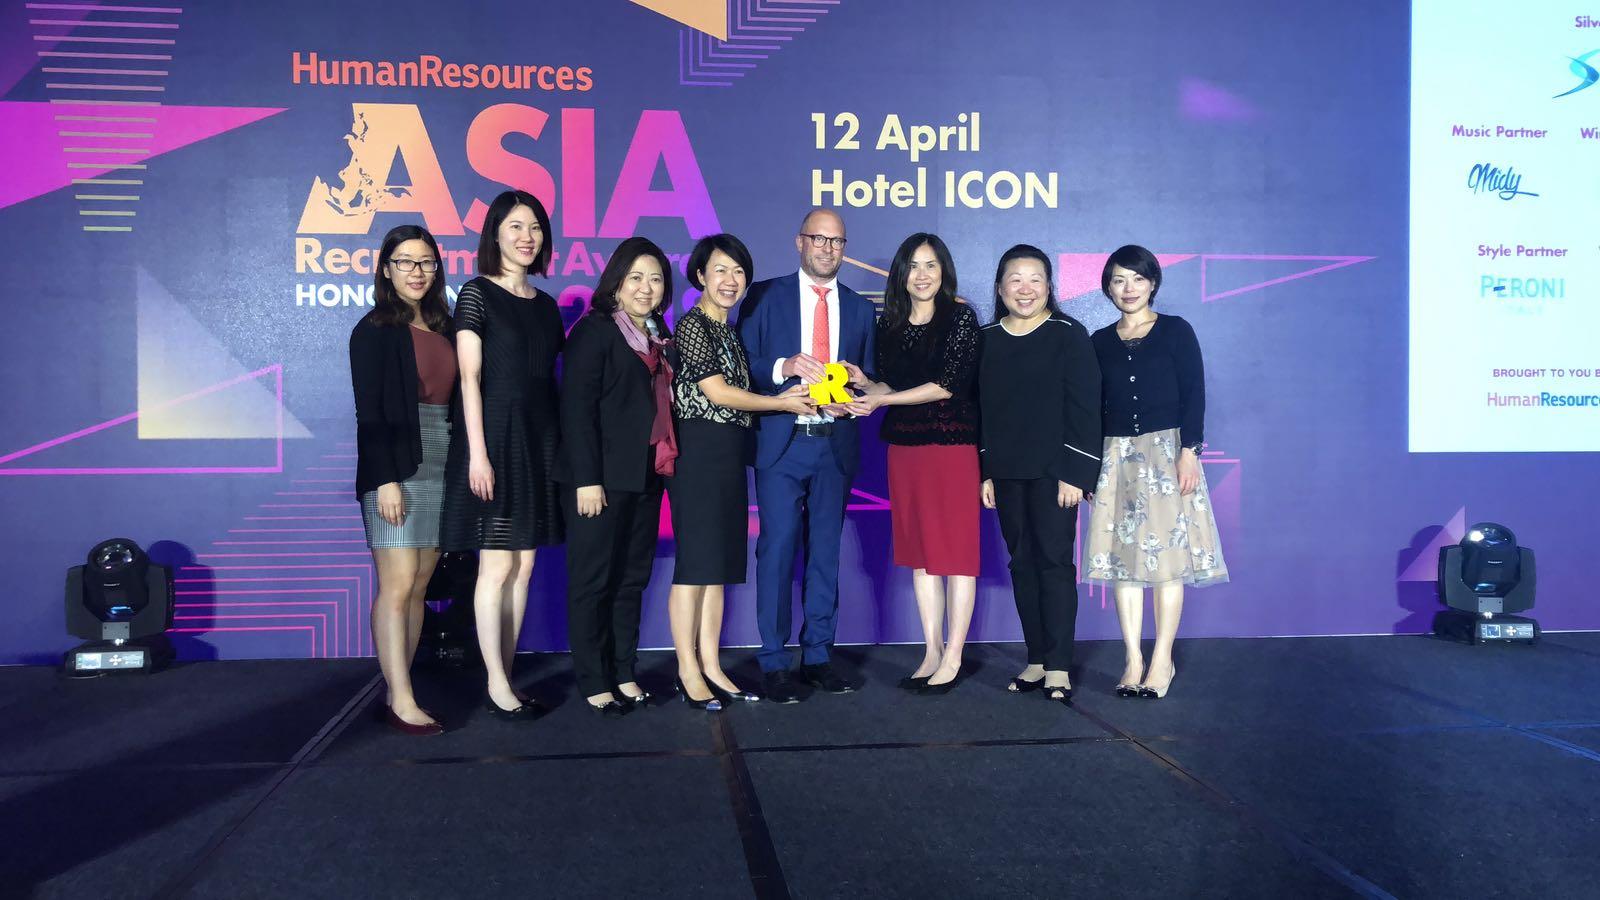 Live: Asia Recruitment Awards 2018, Hong Kong | Human Resources Online